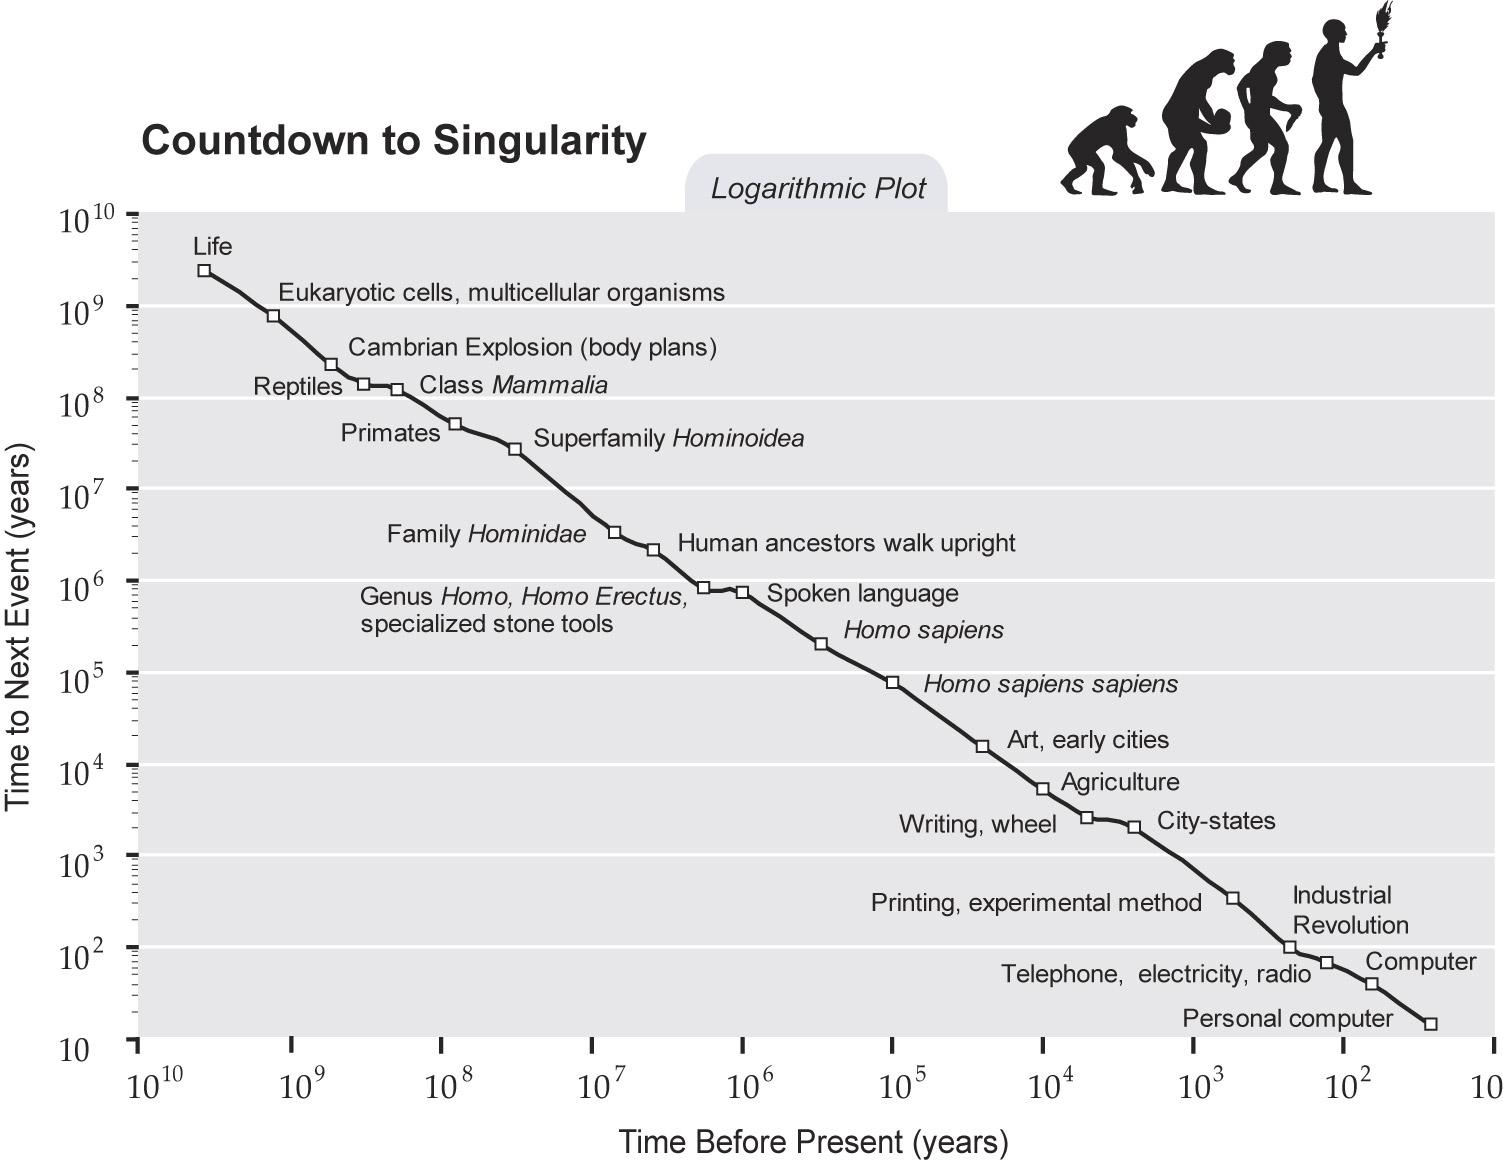 https://i2.wp.com/www.singularity.com/images/charts/CountdowntoSingularityLog.jpg